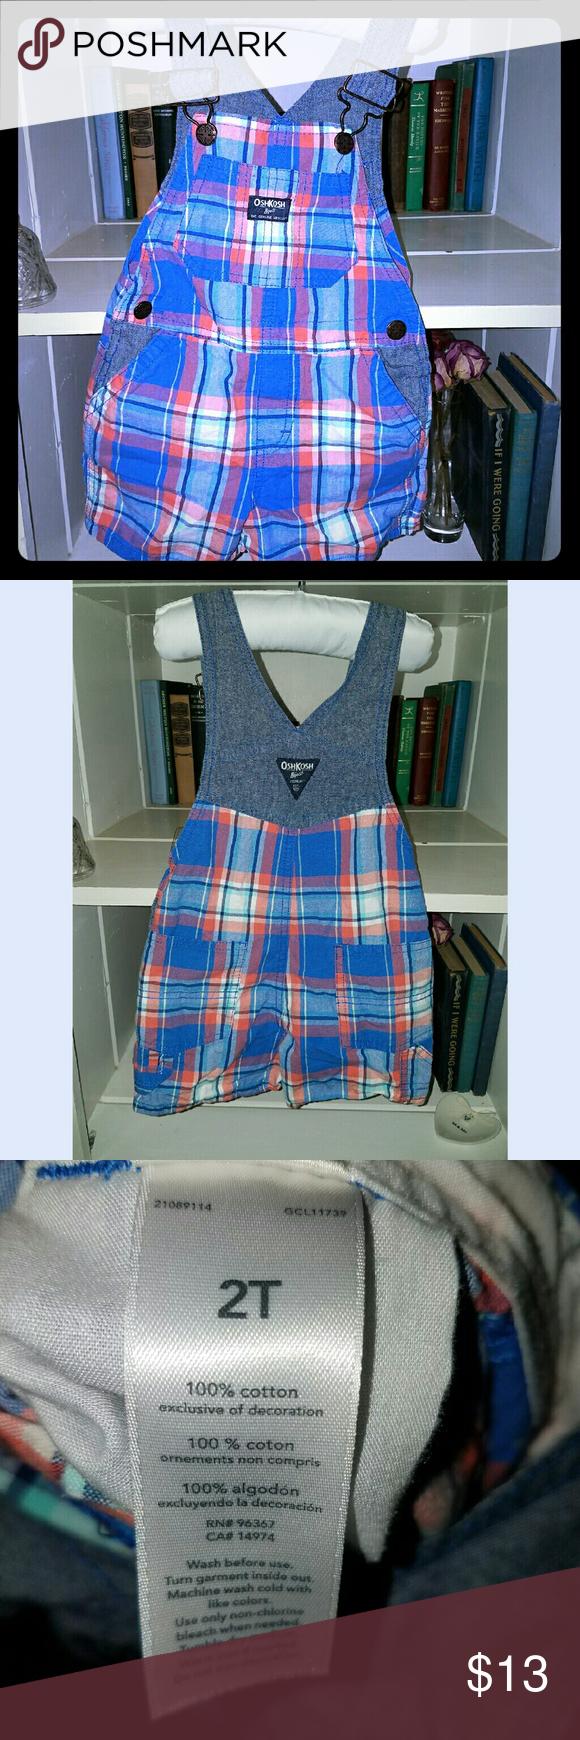 Oshkosh Overalls! Adorable overalls!! Size 2T- 100% cotton  🔥BUNDLE&SAVE🔥PERFECT CONDITION! Osh Kosh One Pieces